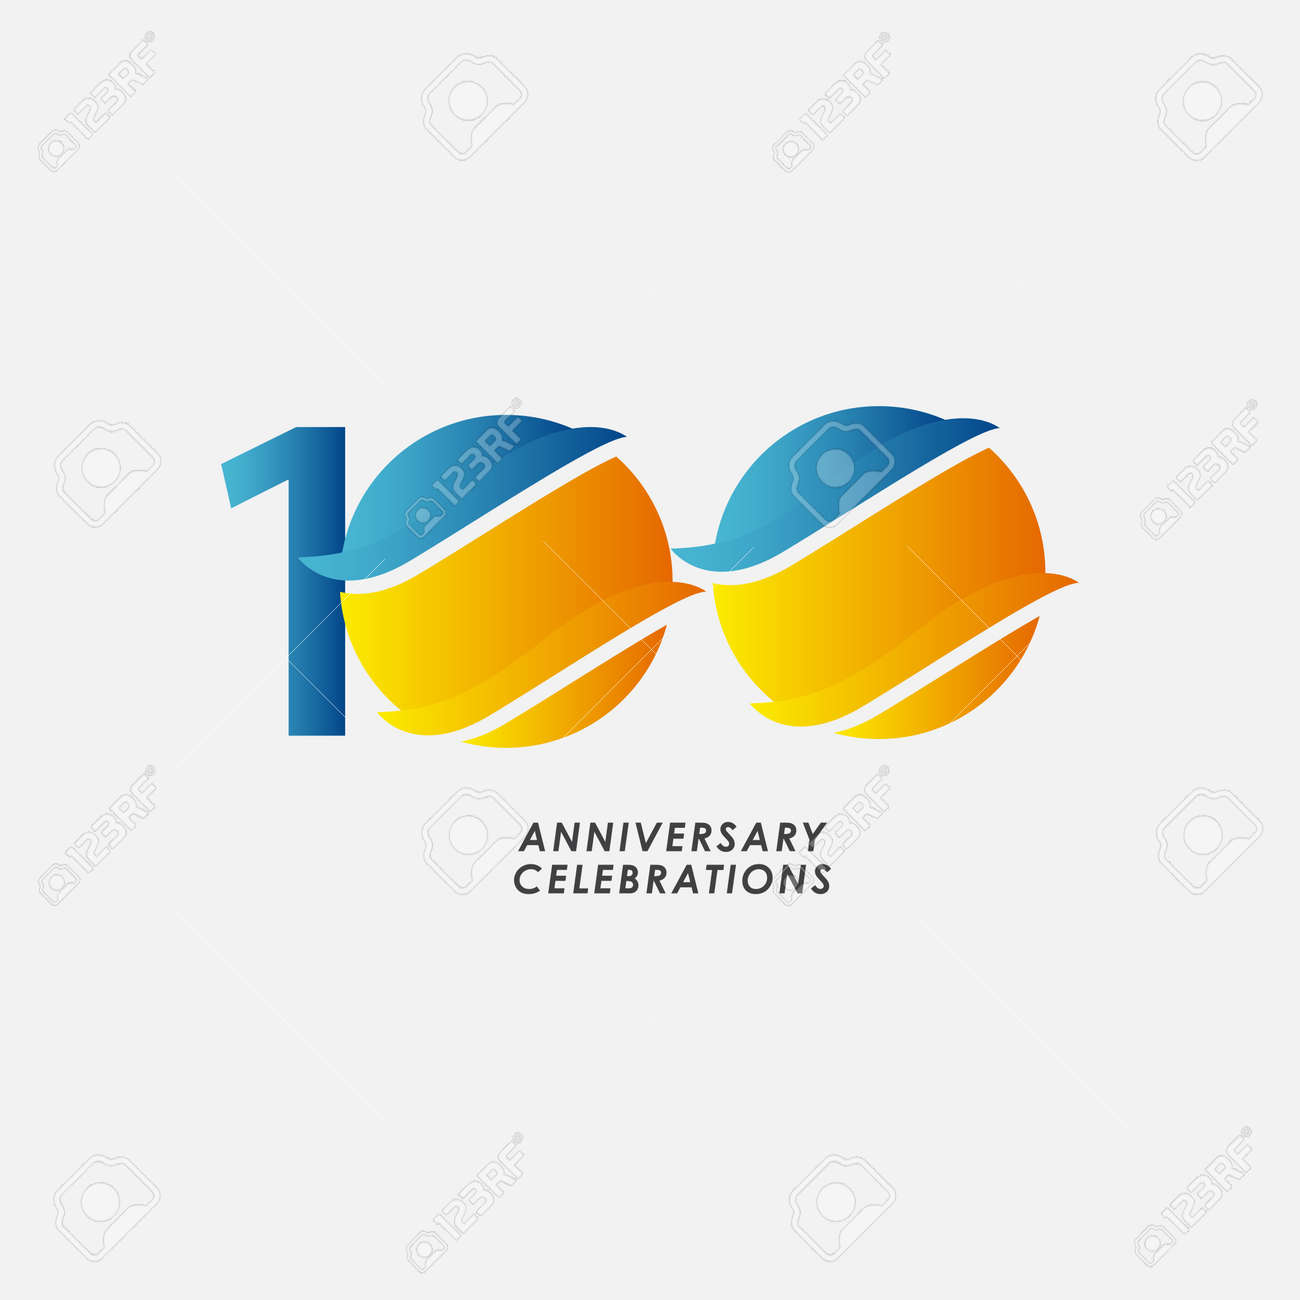 100 Years Anniversary Celebrations Vector Template Design Illustration - 163698029